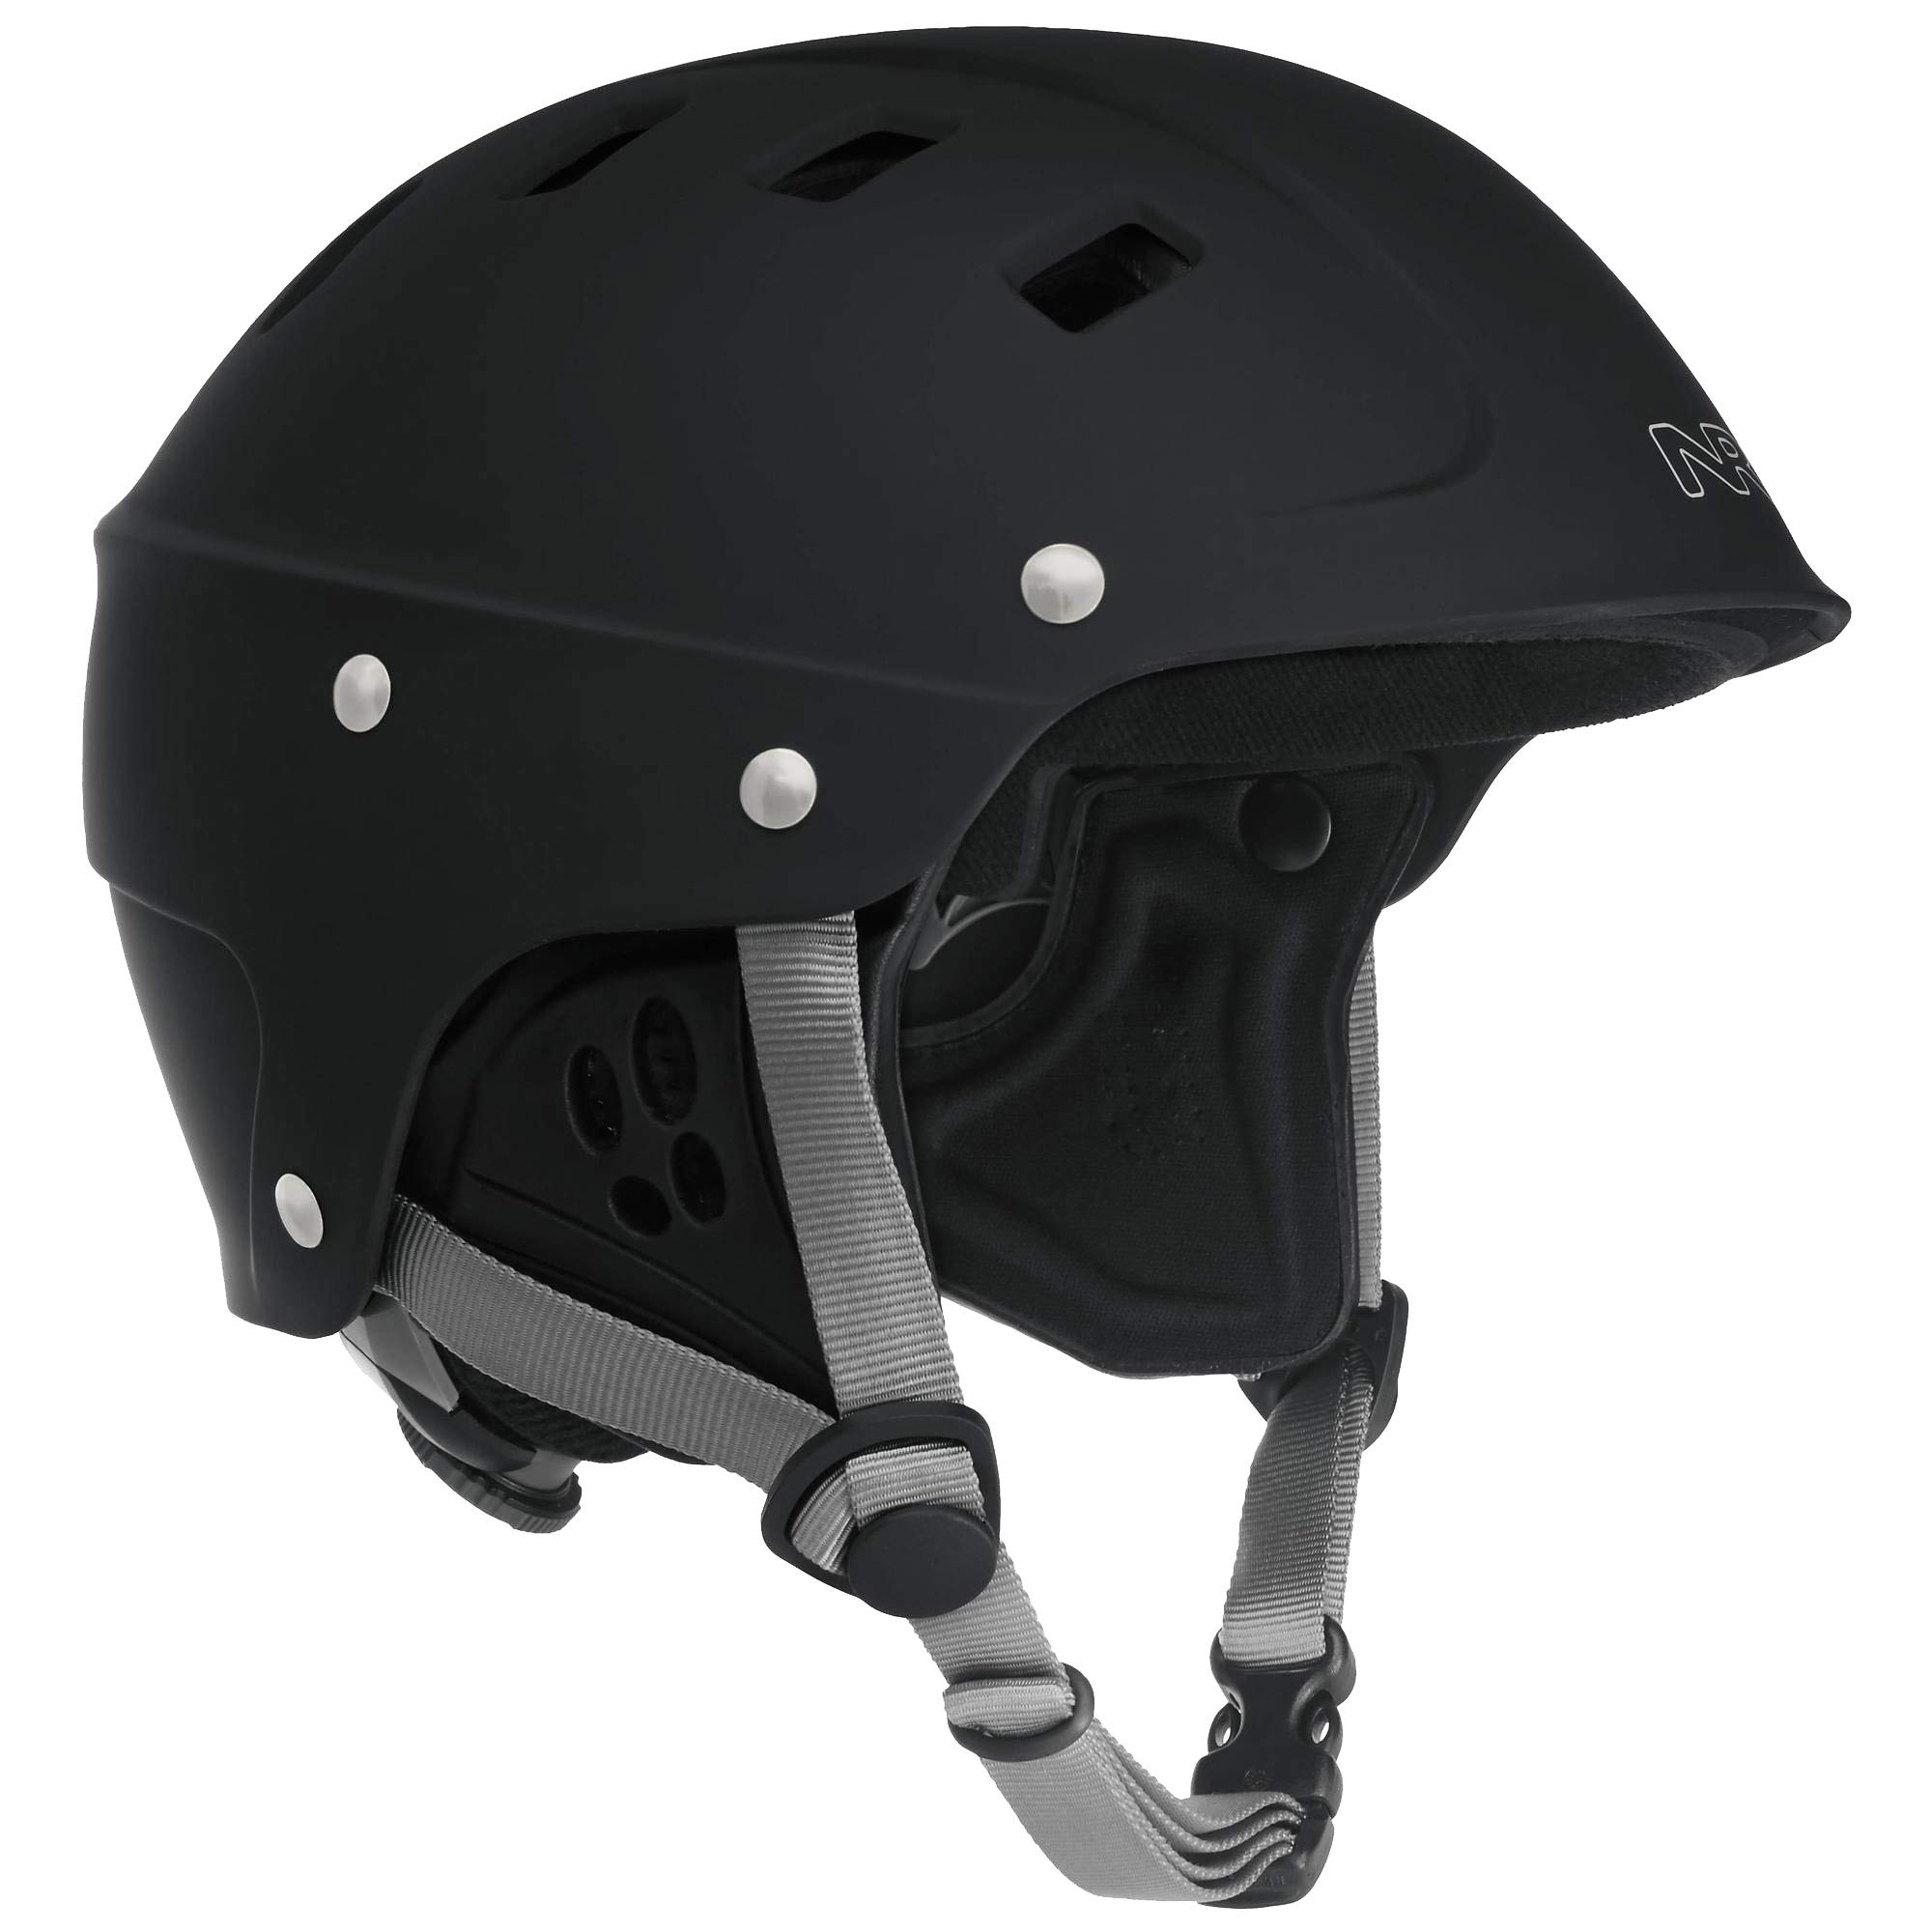 NRS Chaos Side Cut Helmet Black XS by NRS